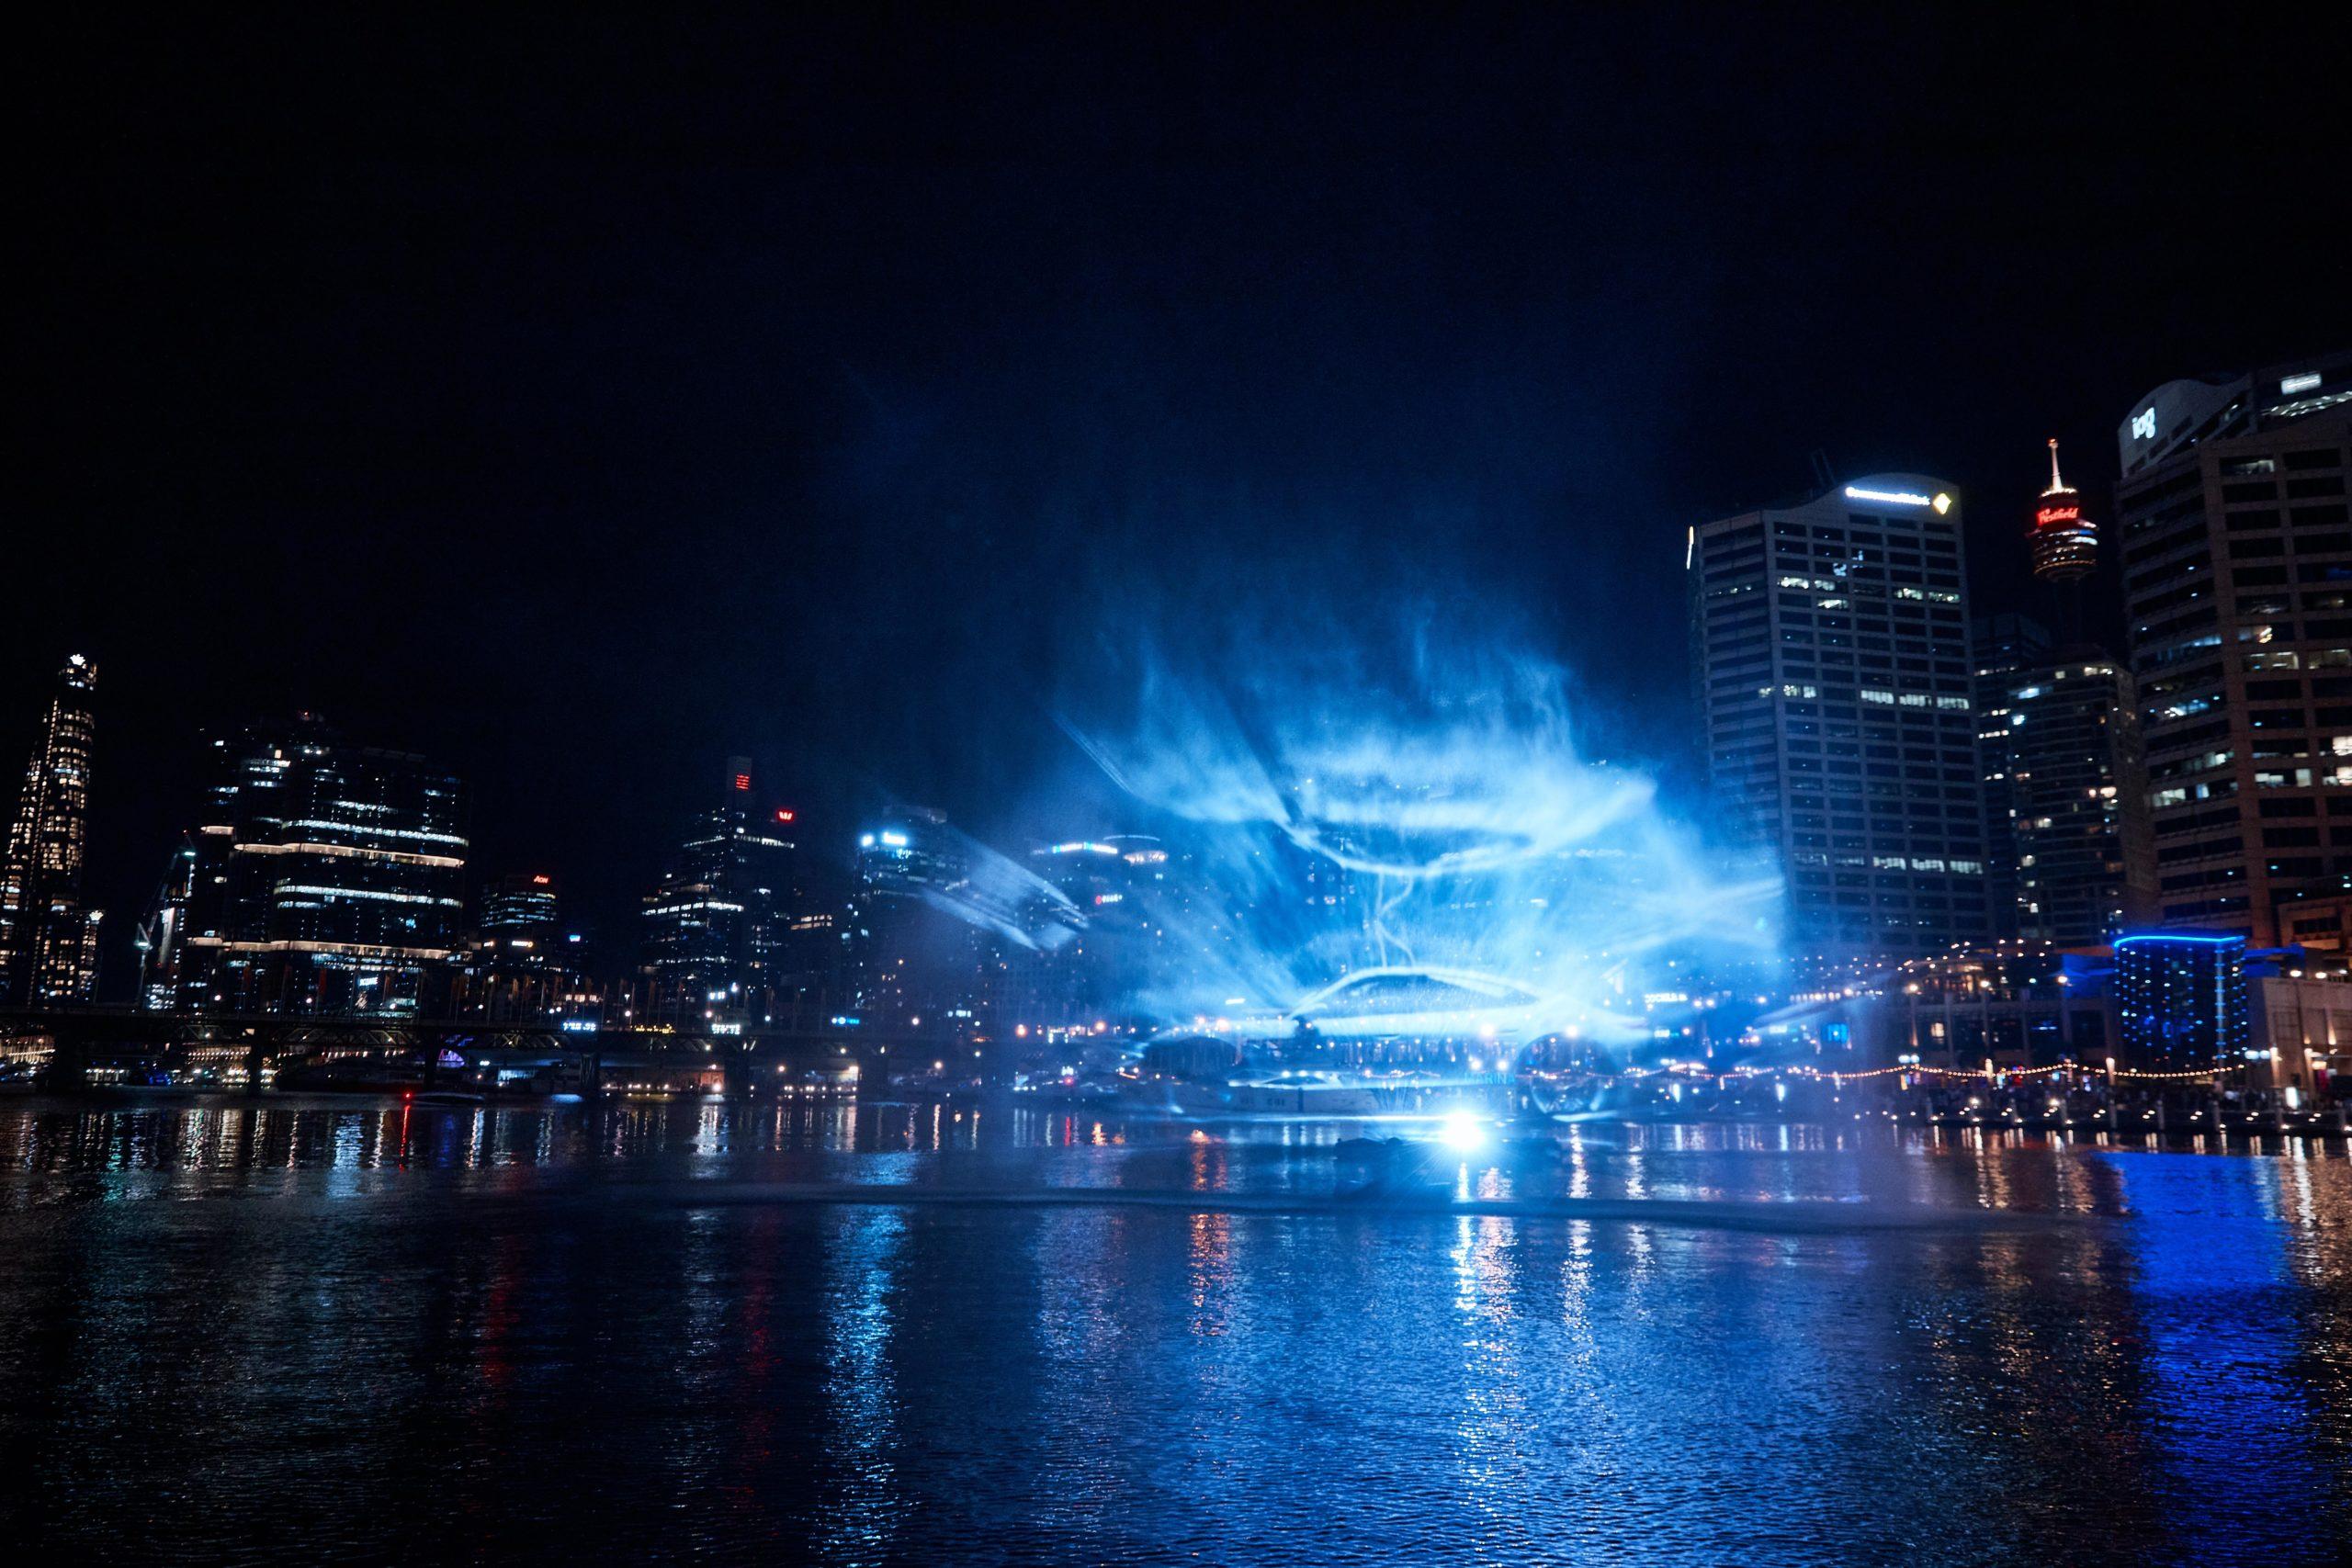 Projektions-Show in Sydney (Fotos: Porsche)